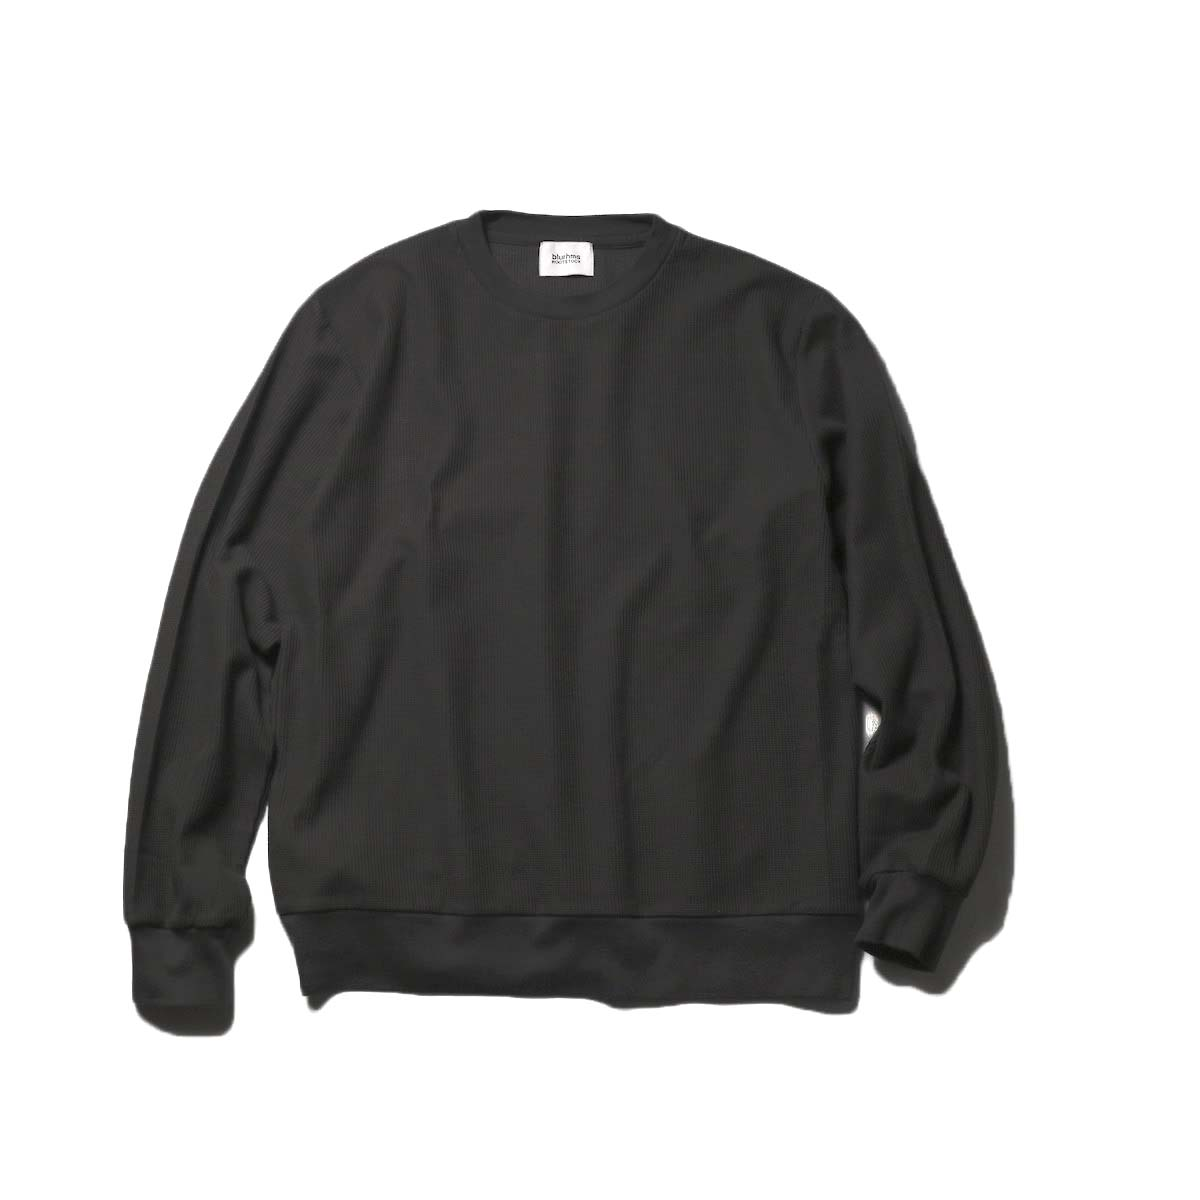 blurhms / New Rough & Smooth Thermal P/O Regular Fit (Black)正面